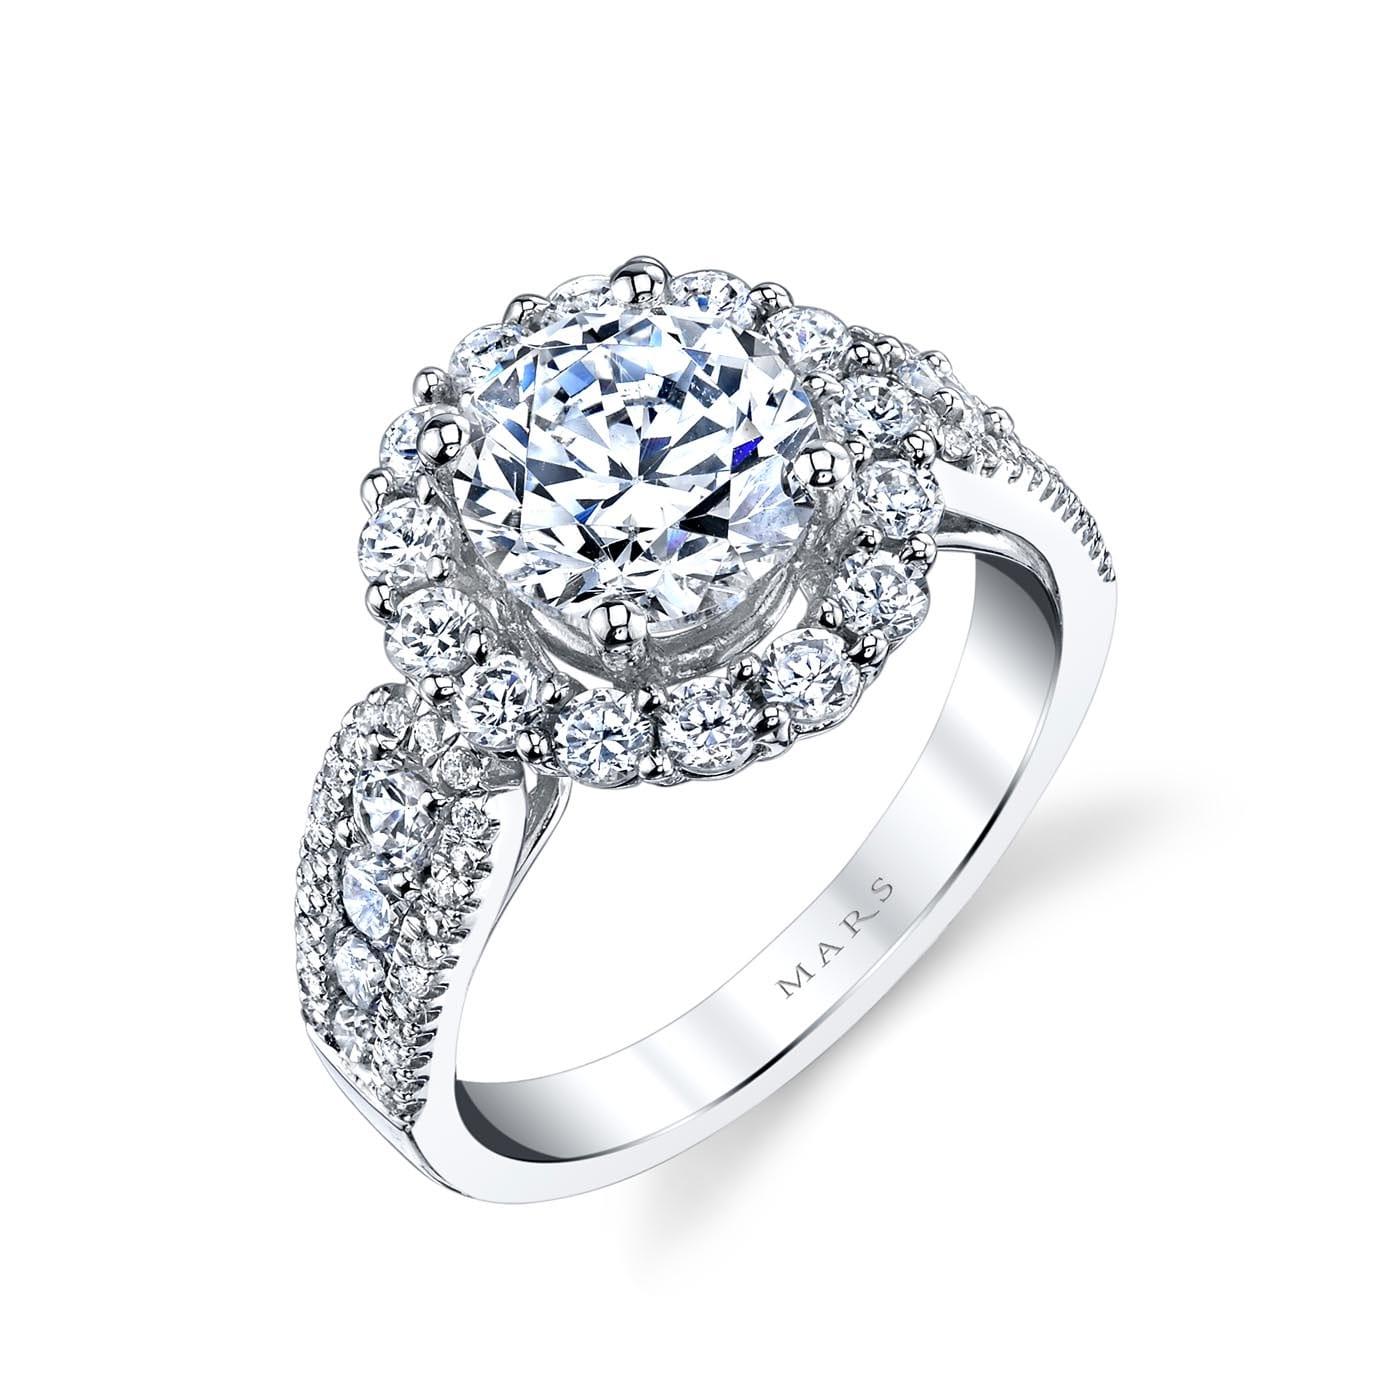 Halo Engagement RingStyle #: MARS 25628